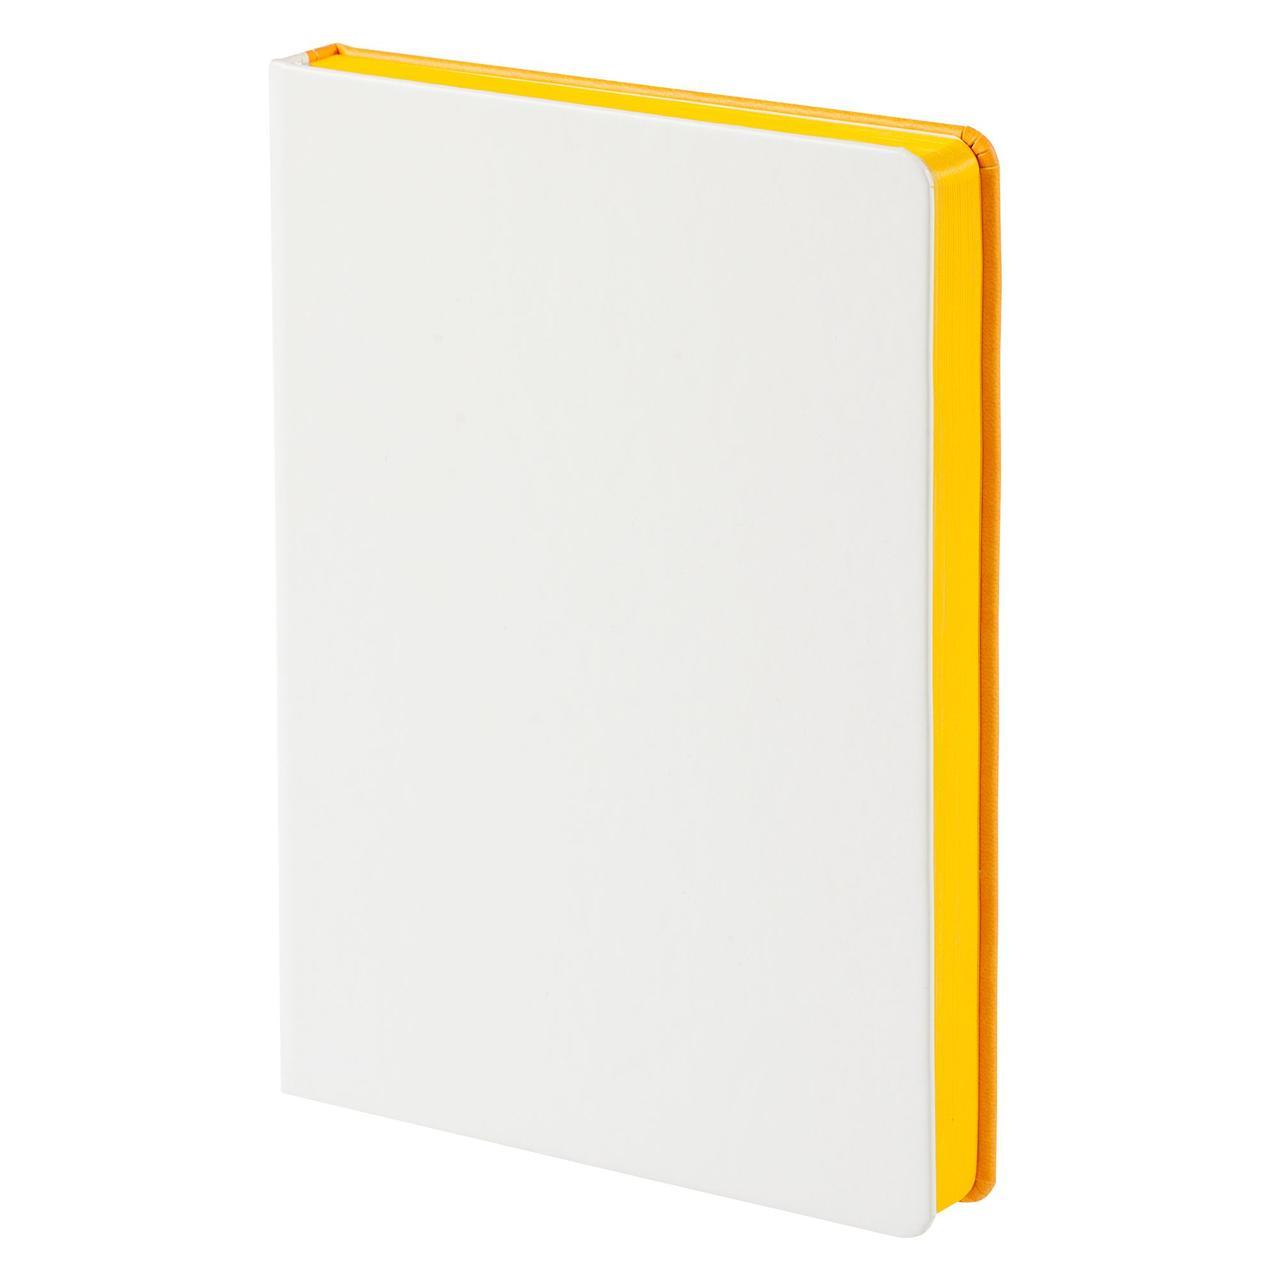 Ежедневник Butterfly, недатированный, белый с желтым (артикул 2804.02)